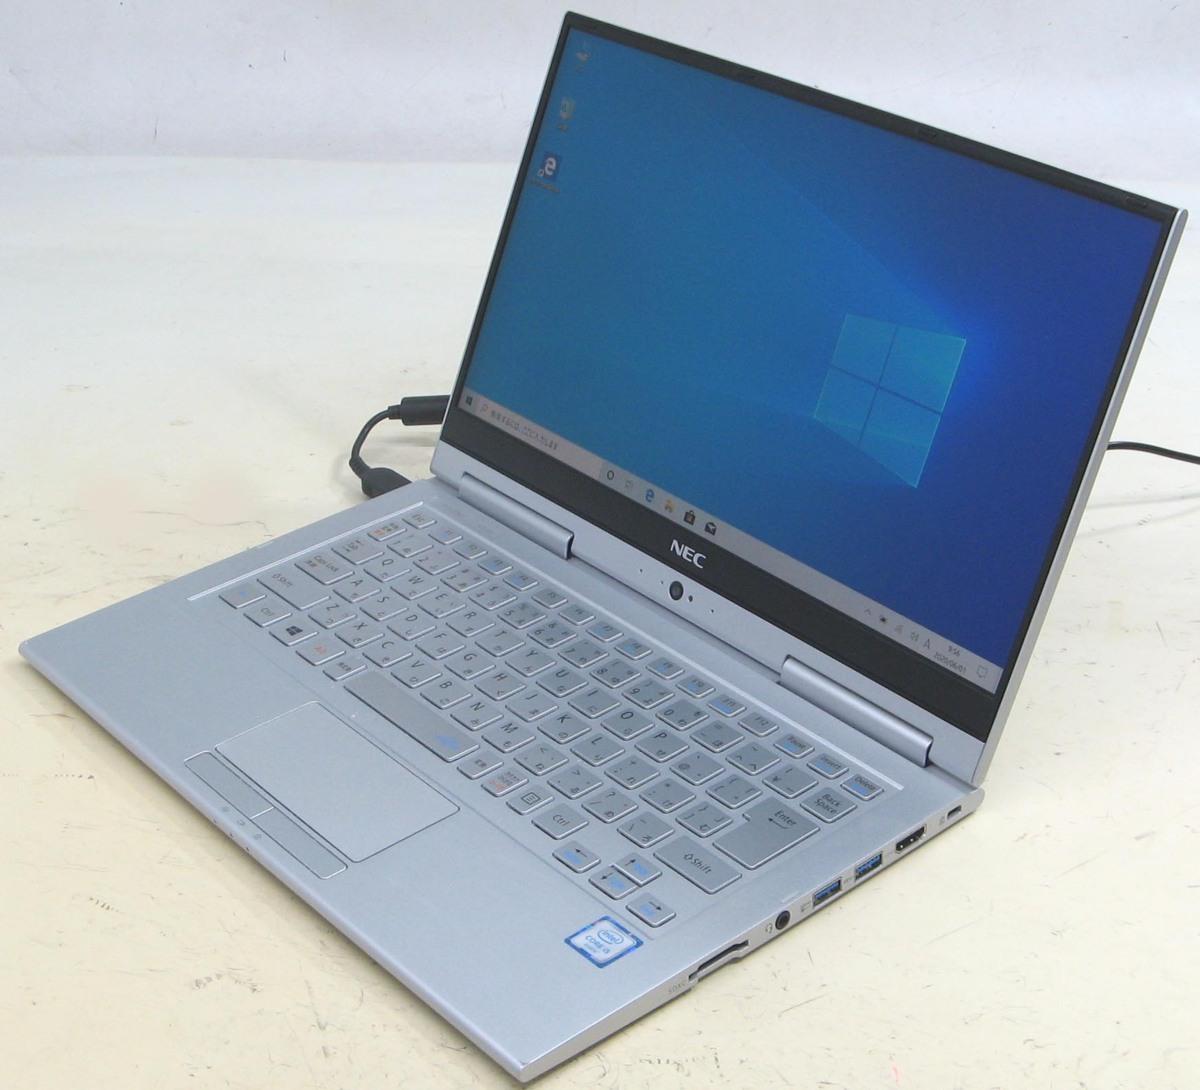 NEC VersaPro PC-VK23TGVDU ノートパソコン webカメラ i5 第6世代 メモリ4G SSD256GB 高解像度 HDMI Windows 10 ノートパソコン【中古パソコン】【中古】